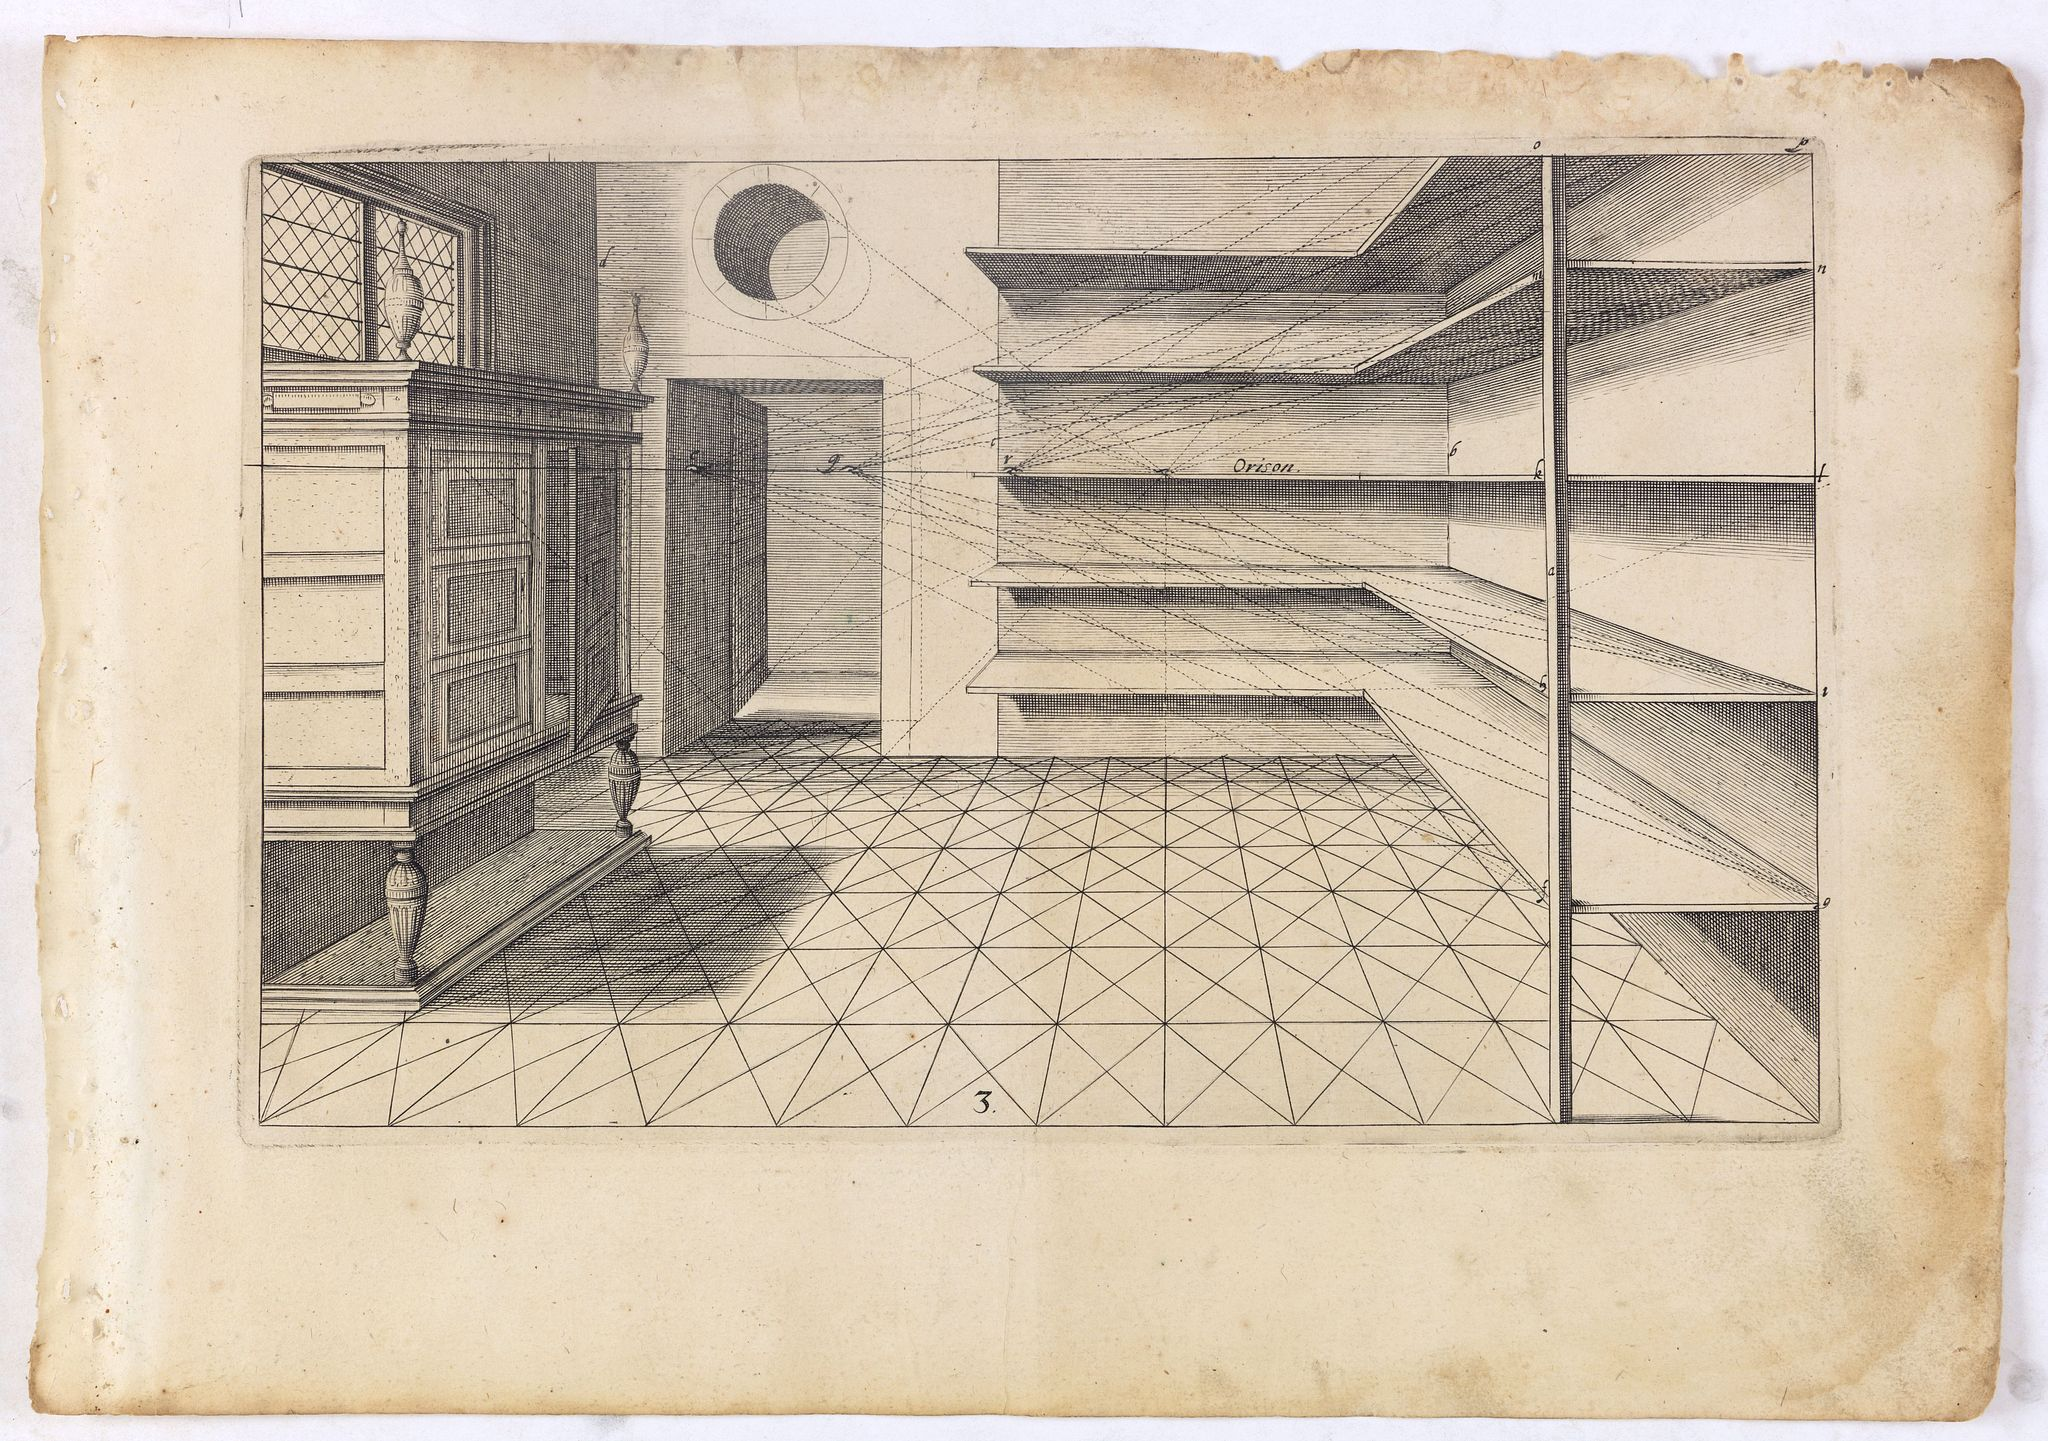 VREDEMAN DE VRIES, J. / HONDIUS, H. -  Perspective print by Vredeman de Vries. 3